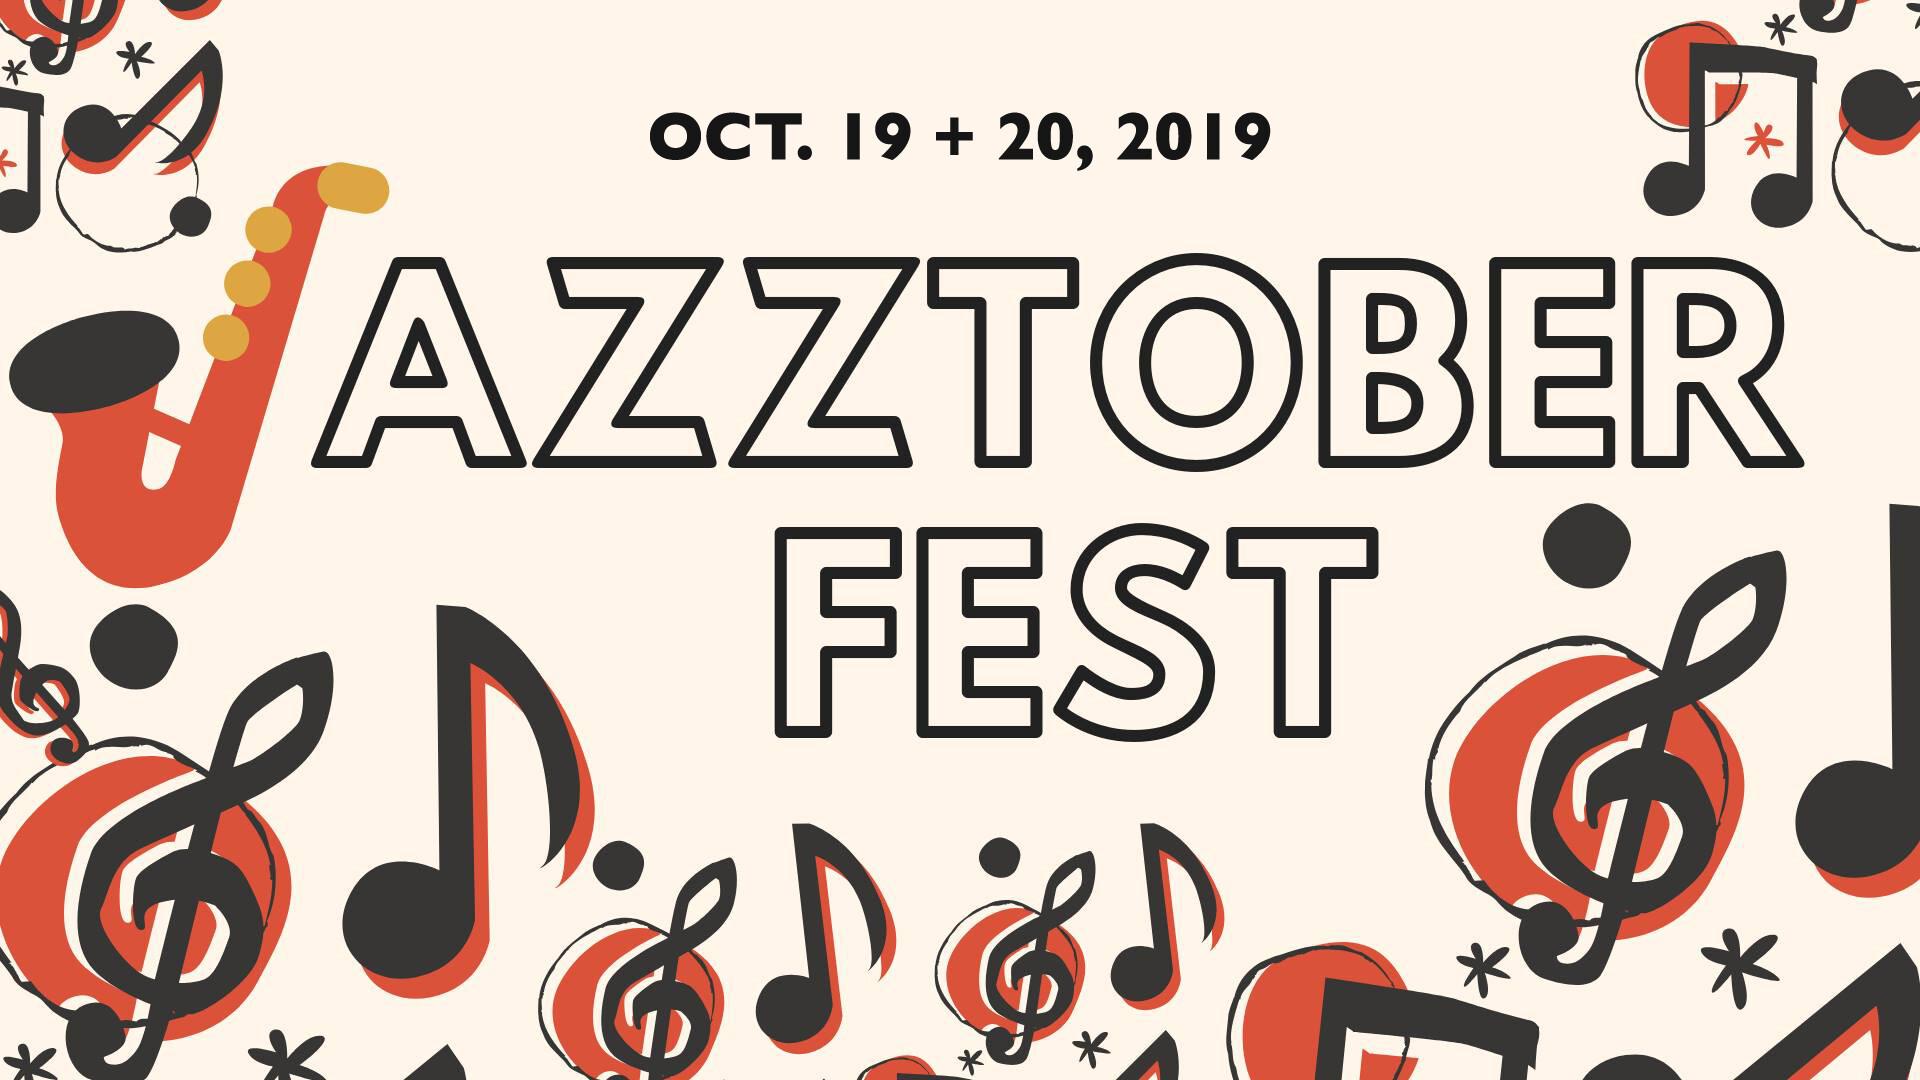 Falmouth Jazz Fest 2019 Jazztober Fest